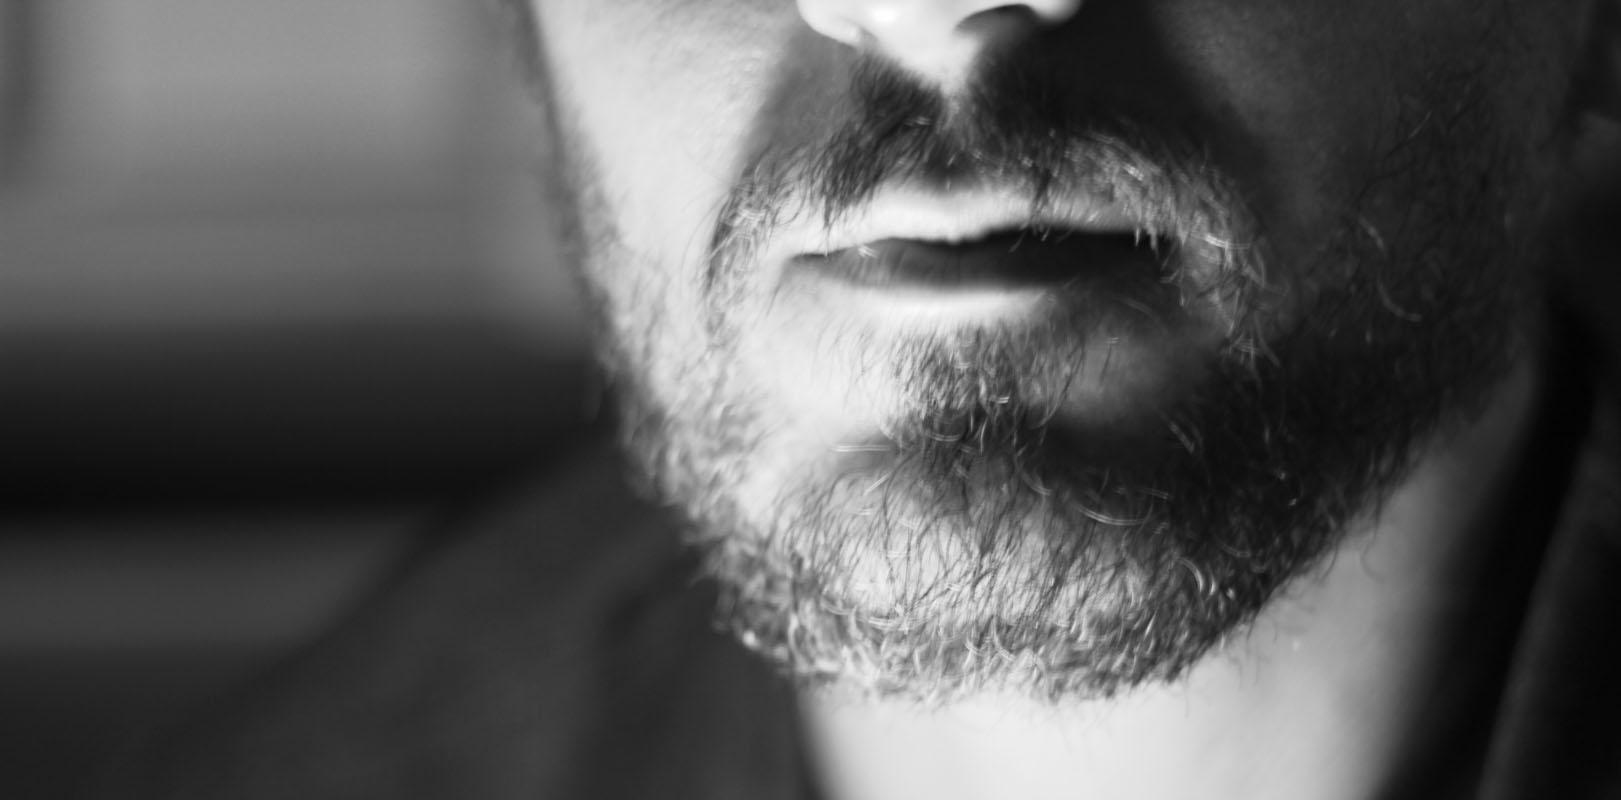 beard-hairy-face-goatee-stubble